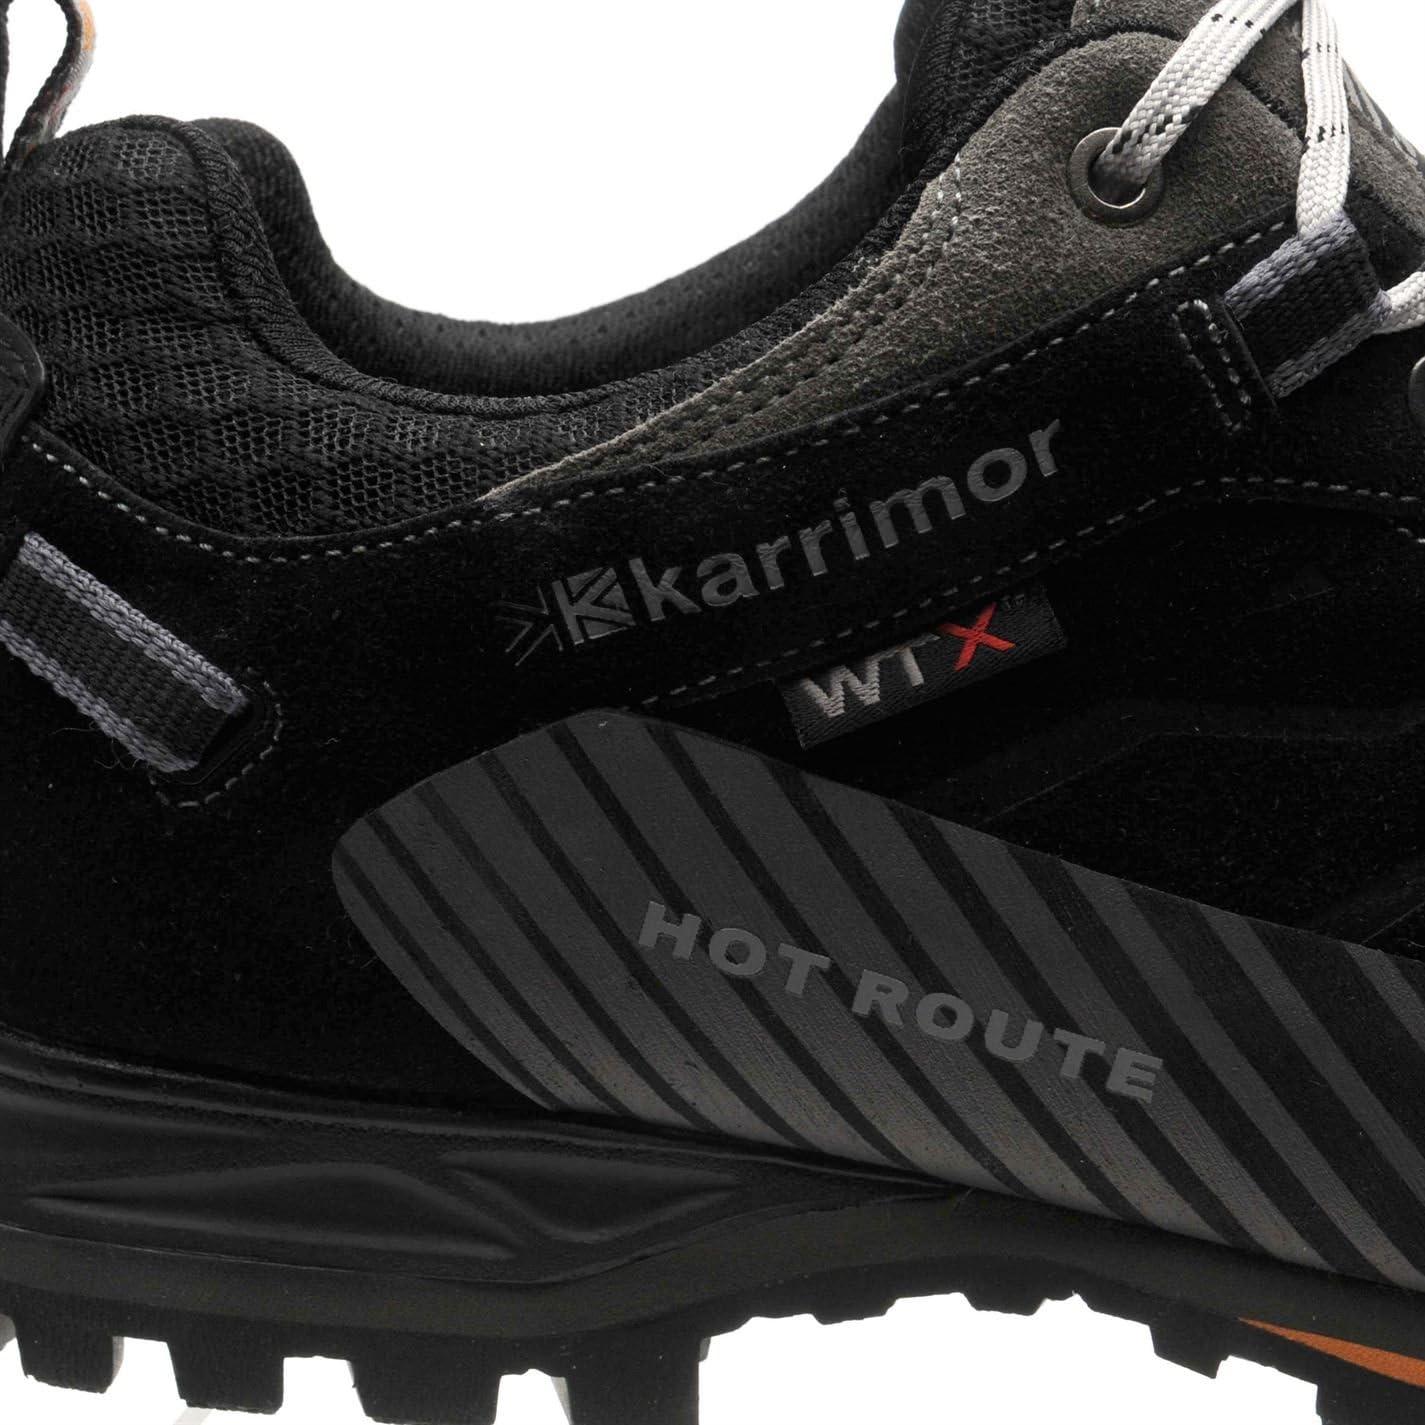 Karrimor Womens Hot Route Waterproof Walking Shoes